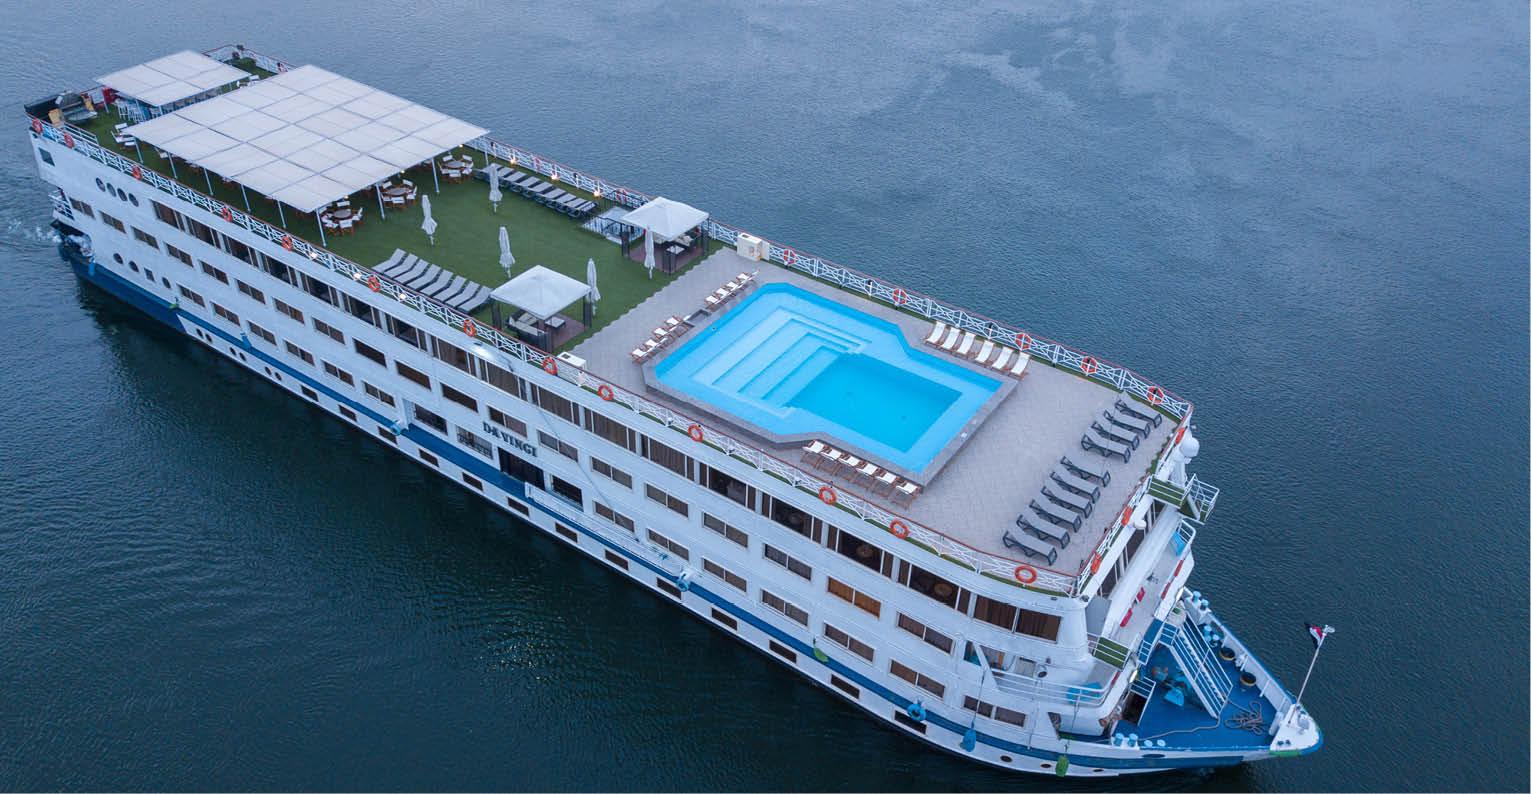 Circuit Coeur de l'Egypte - Top Clubs Cruise M/S Da Vinci 5* - Egypte